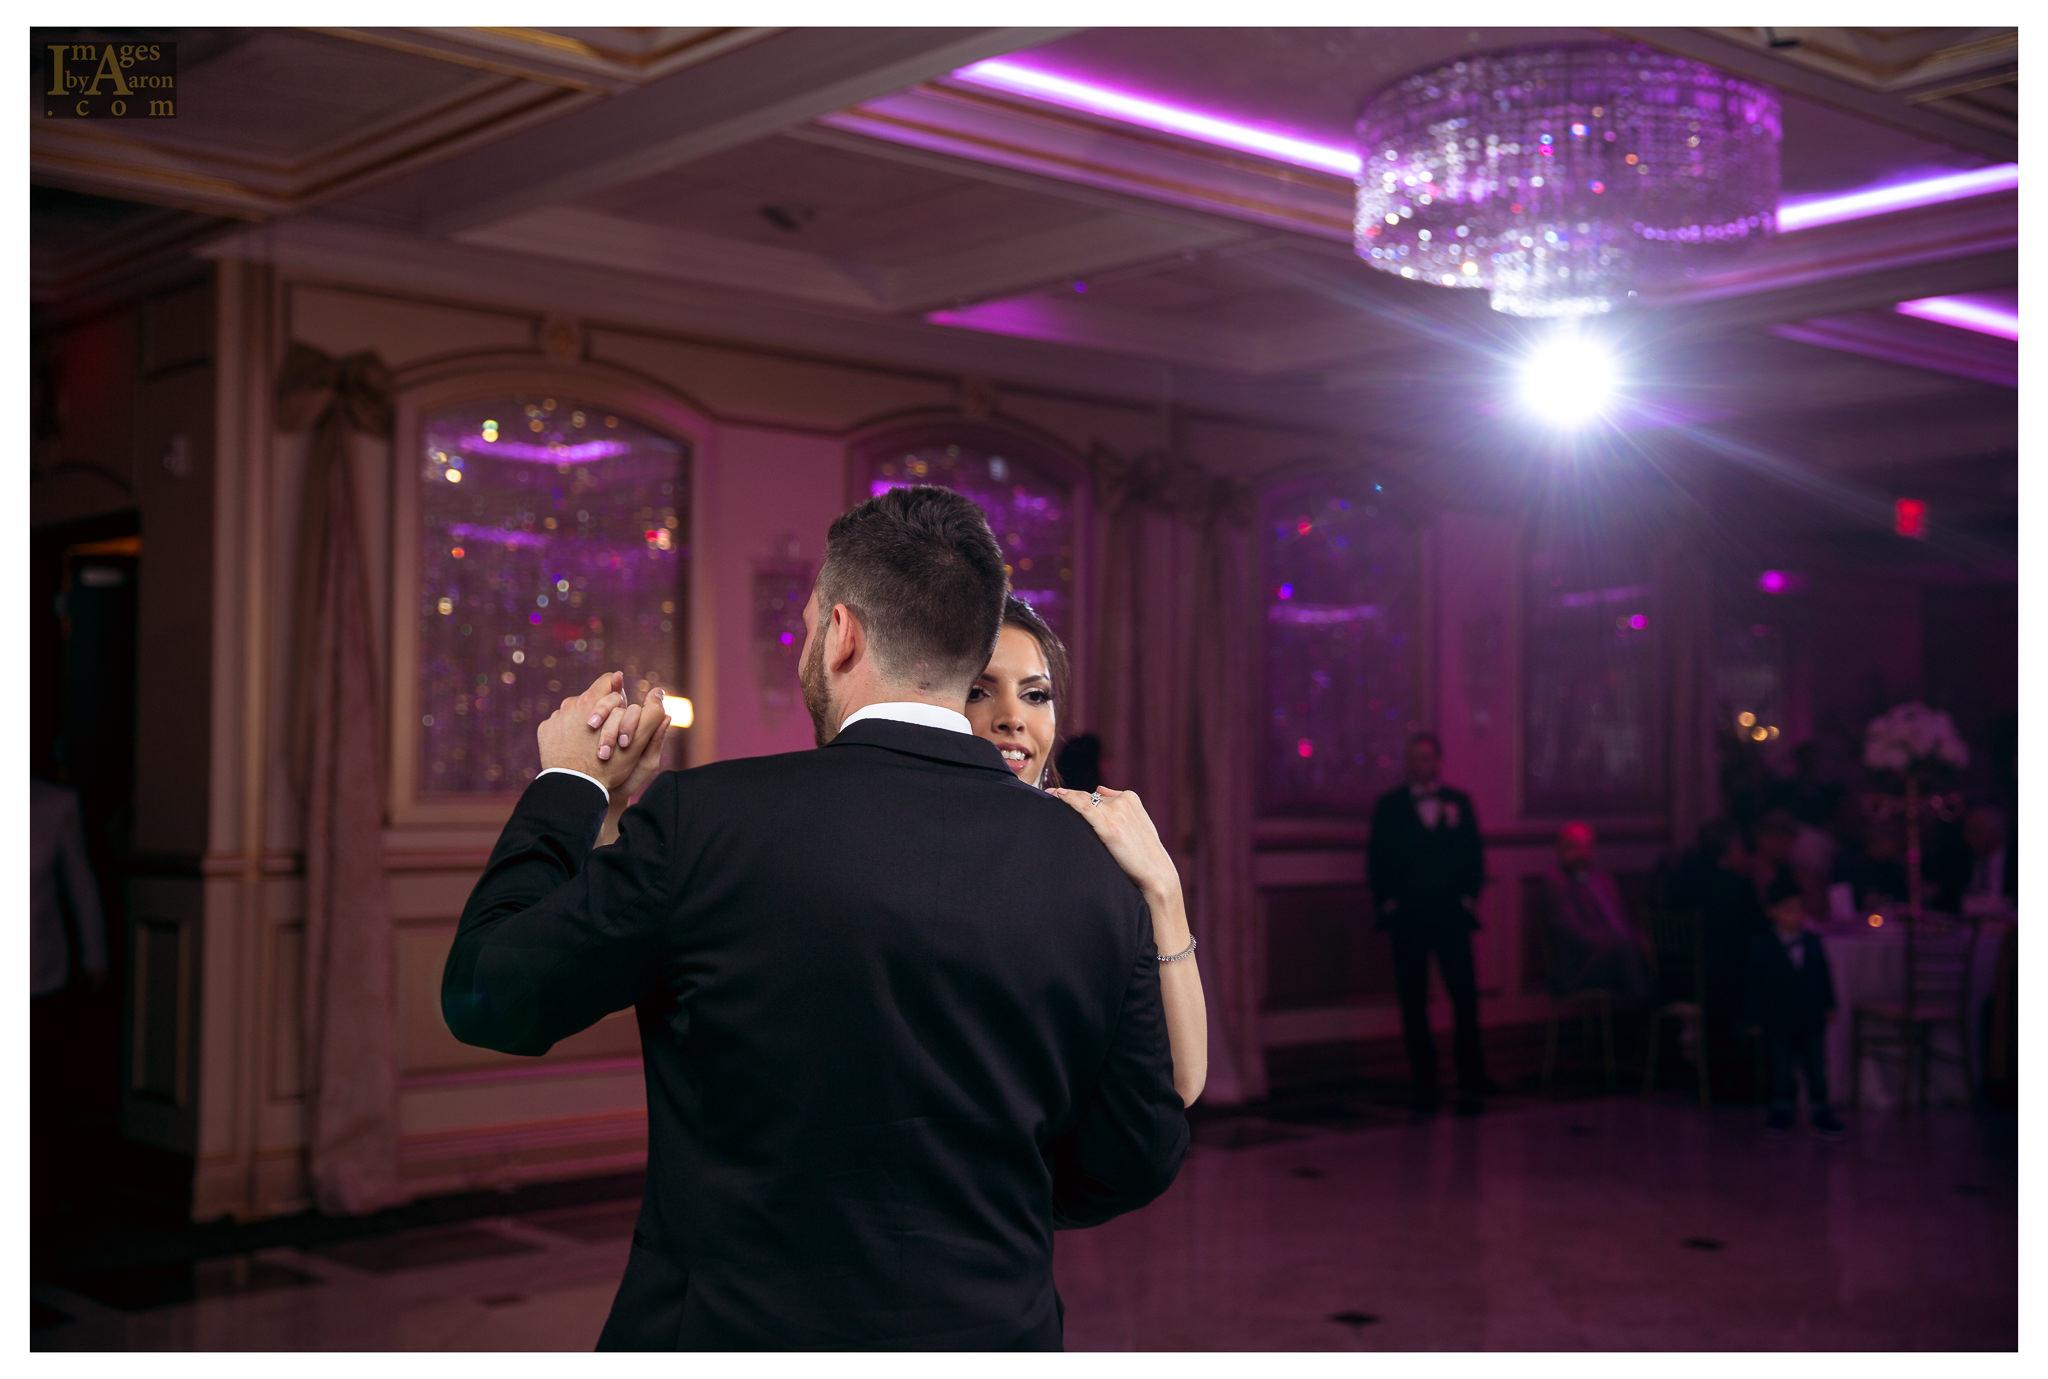 Gokce Turkish Wedding Reception New York Photographer Wedding Photography The Royal Manor-13.jpg